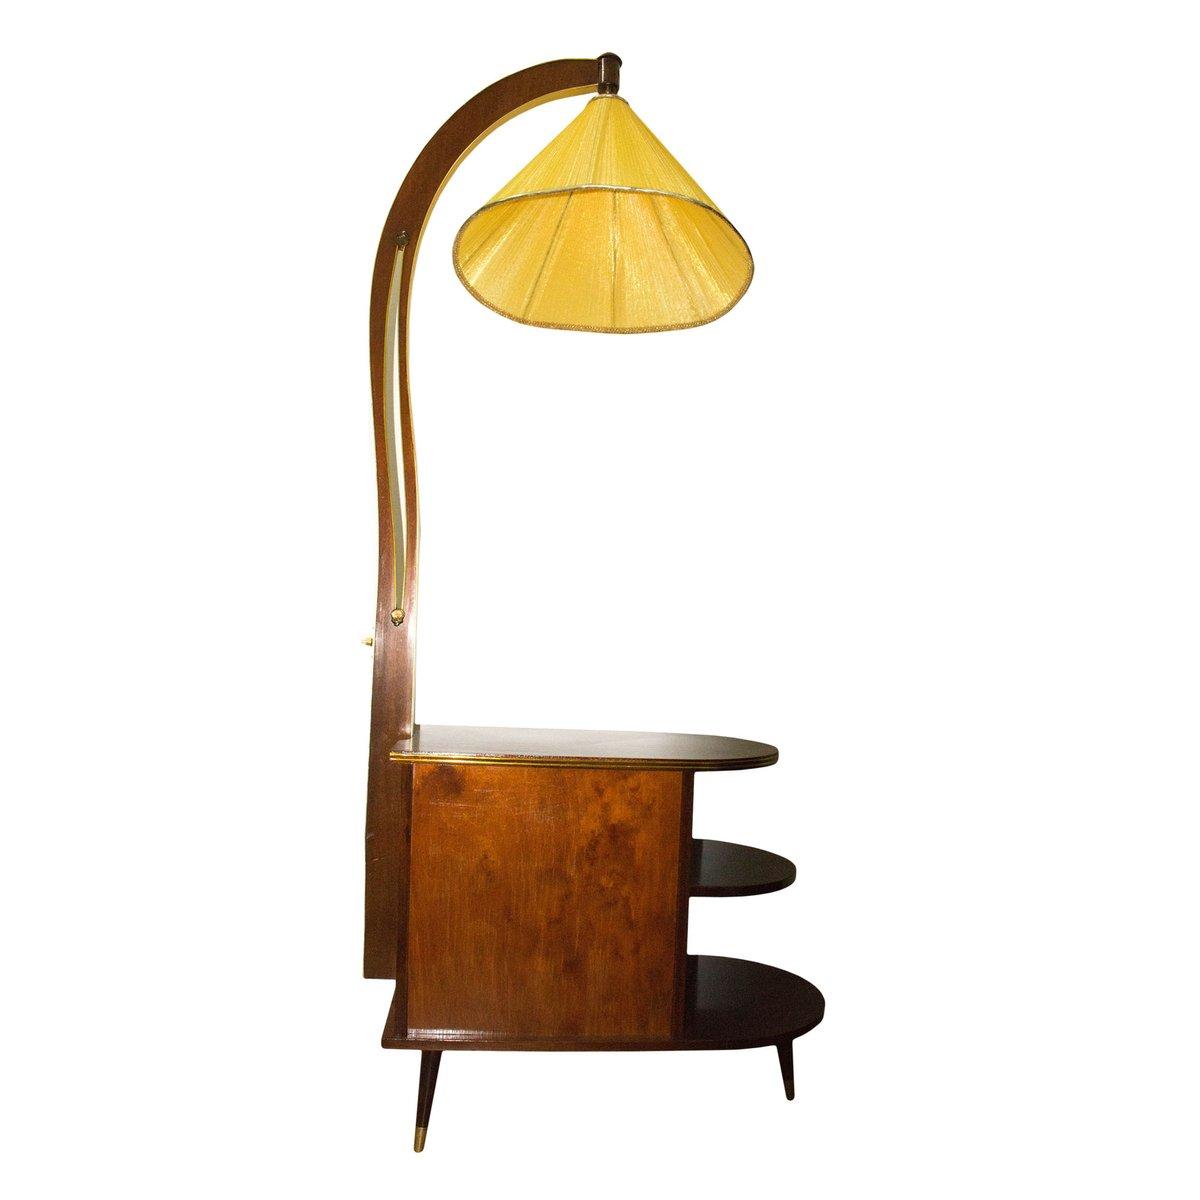 vintage art deco minibar mit lampe bei pamono kaufen. Black Bedroom Furniture Sets. Home Design Ideas